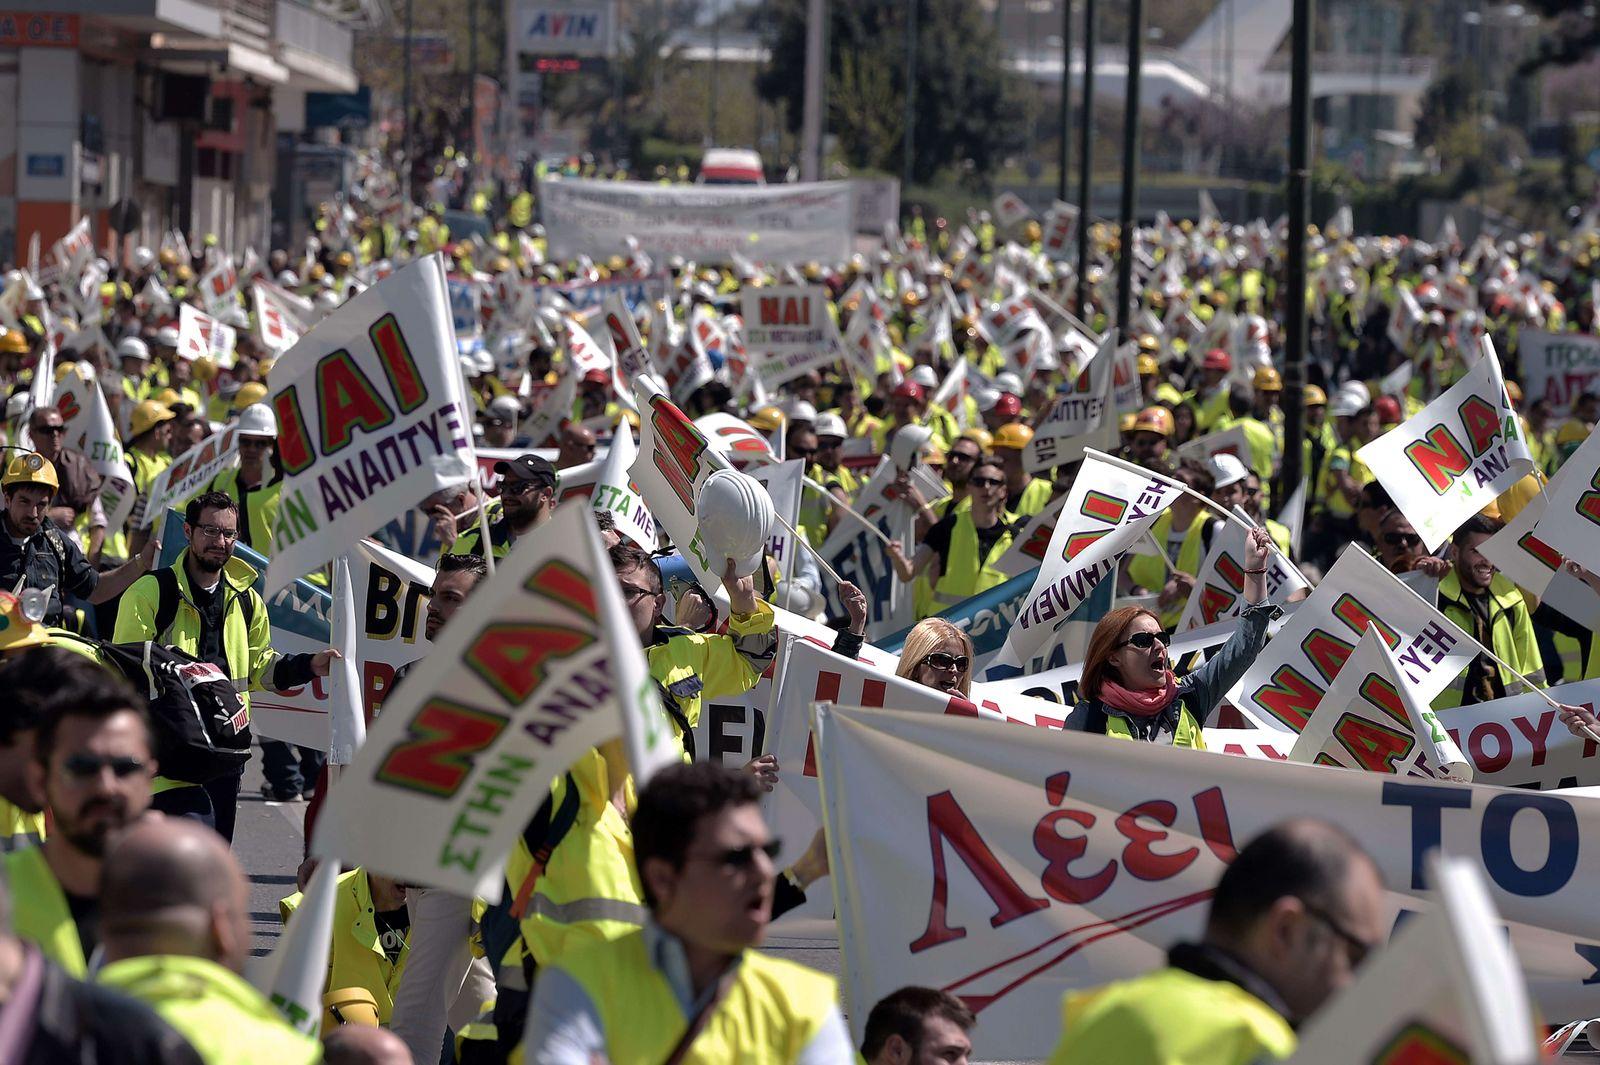 GREECE-POLITICS-ECONOMY-MINES-DEMO Griechenland Goldmine Demo Arbeiter